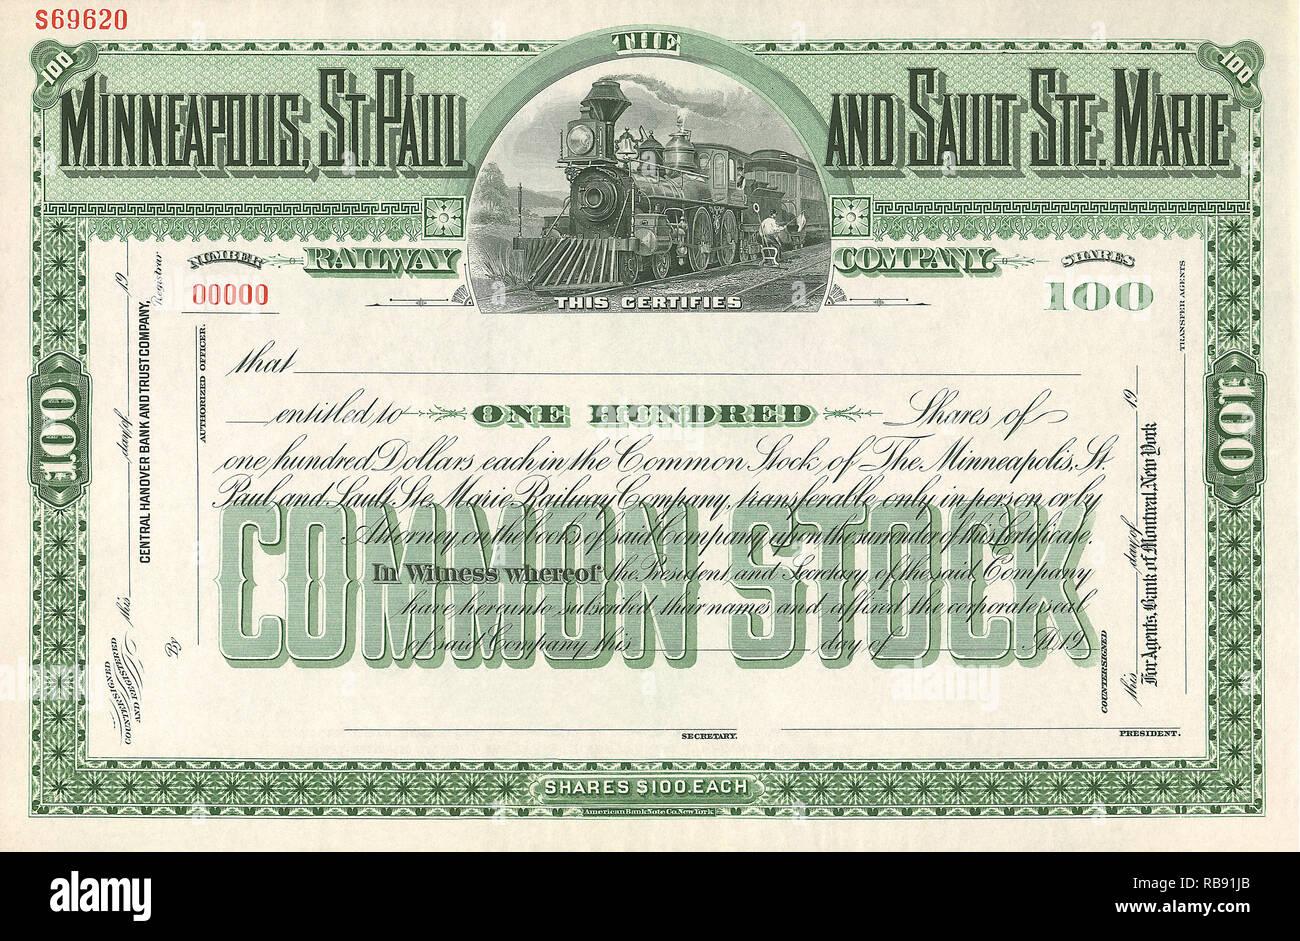 Railroad Stock - Stock Image